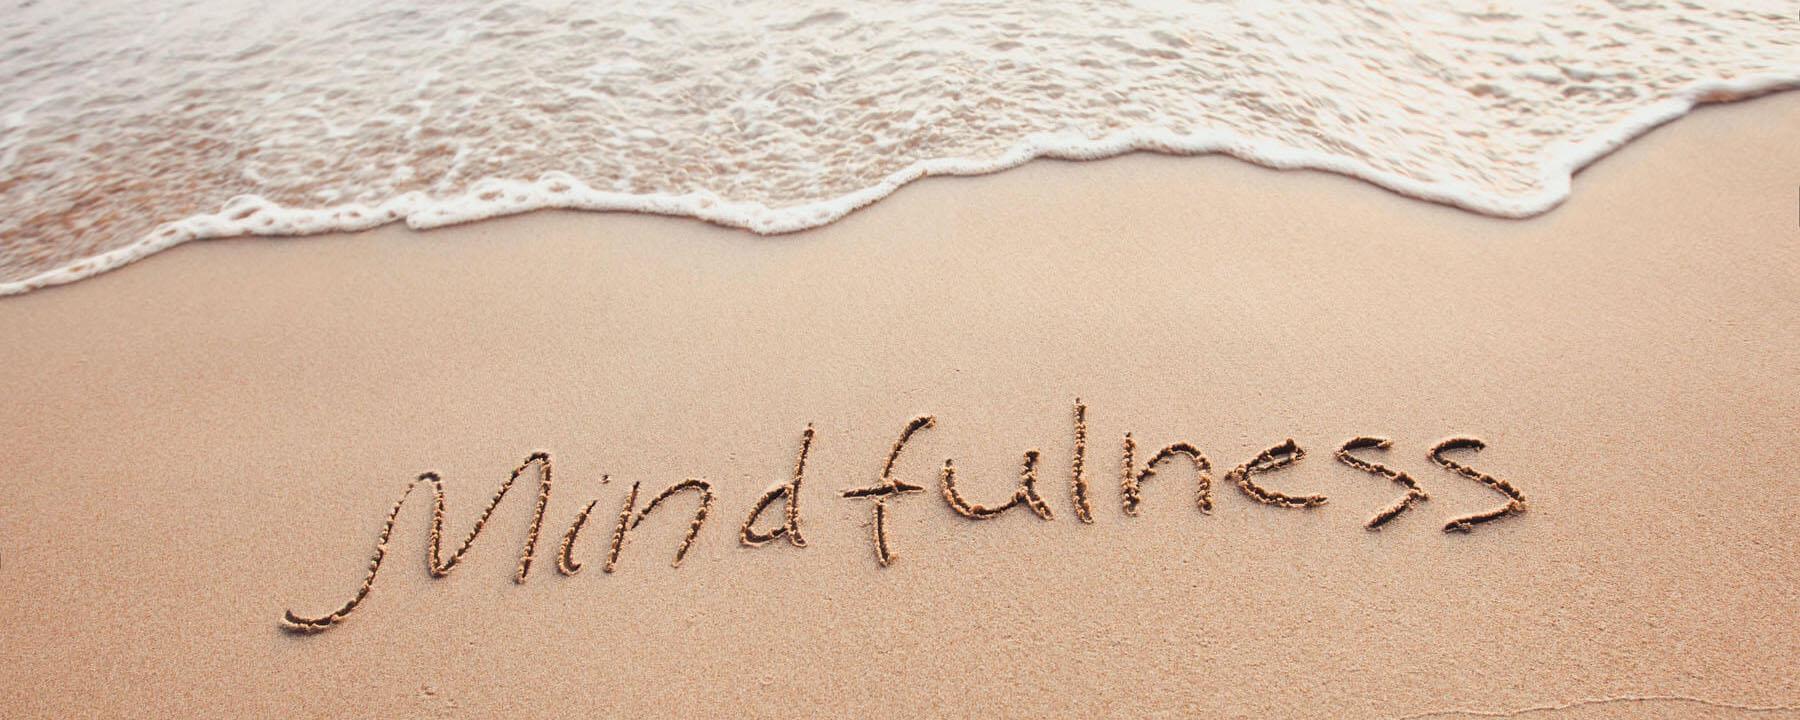 Mindfulness image